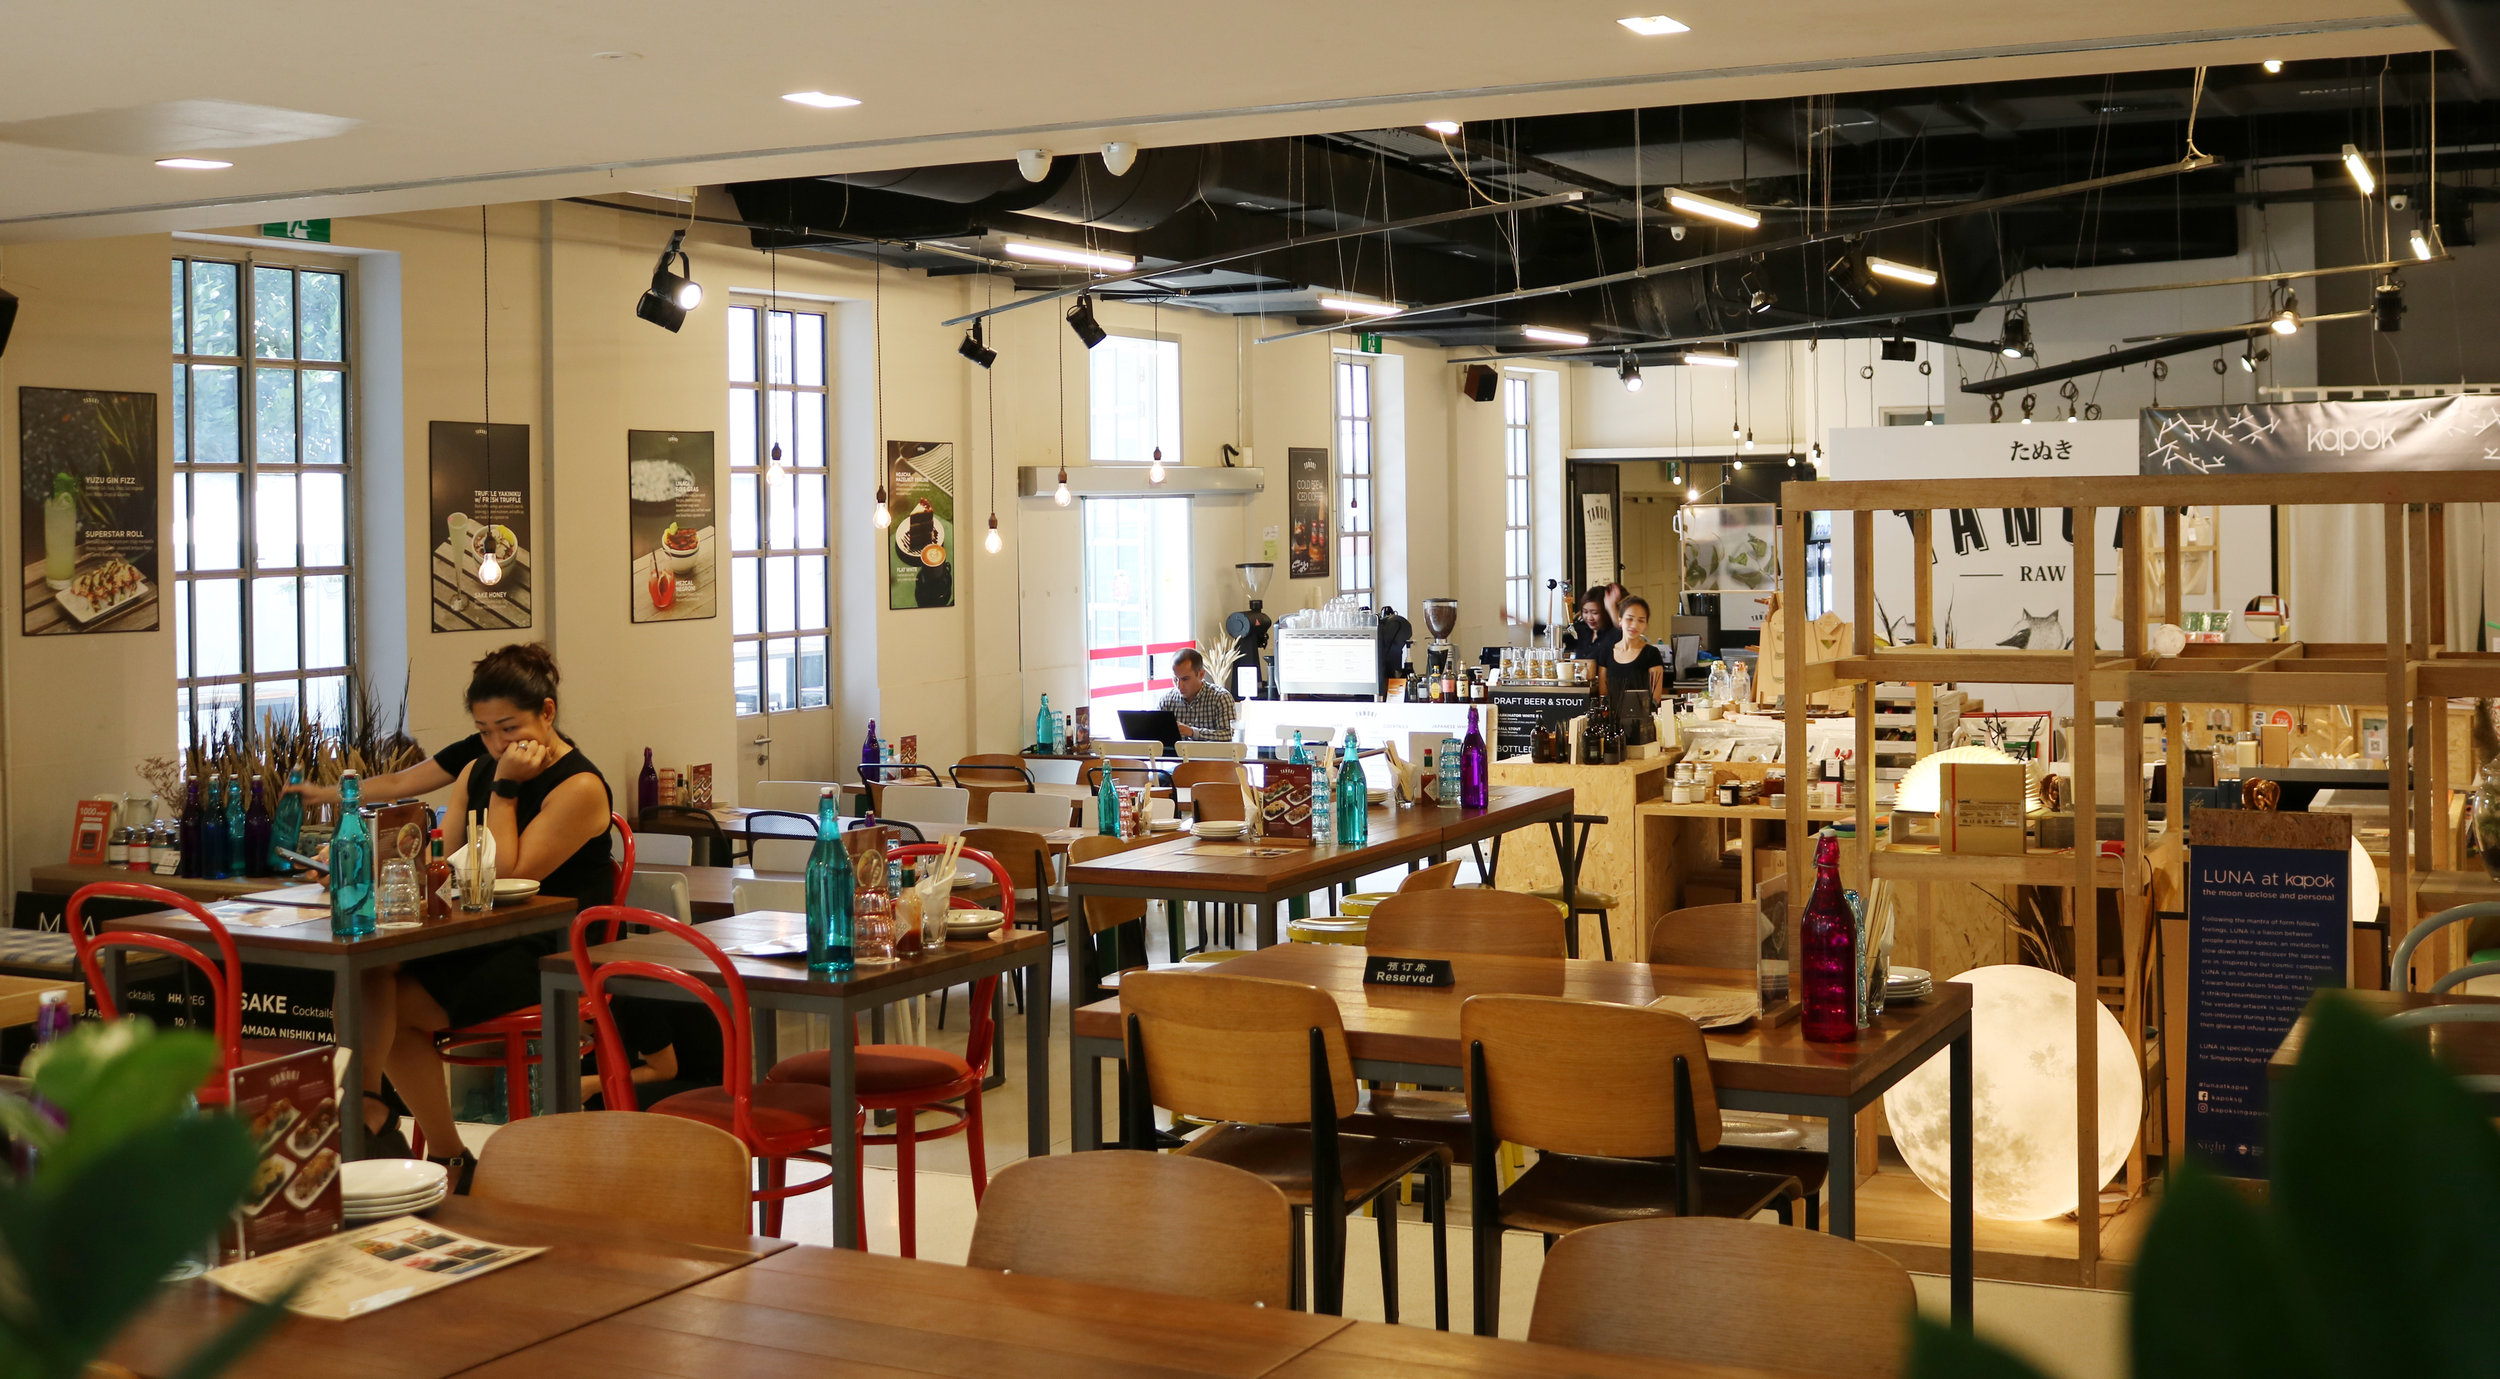 Tanuki Raw at kapok lifestyle restaurant cafe.JPG